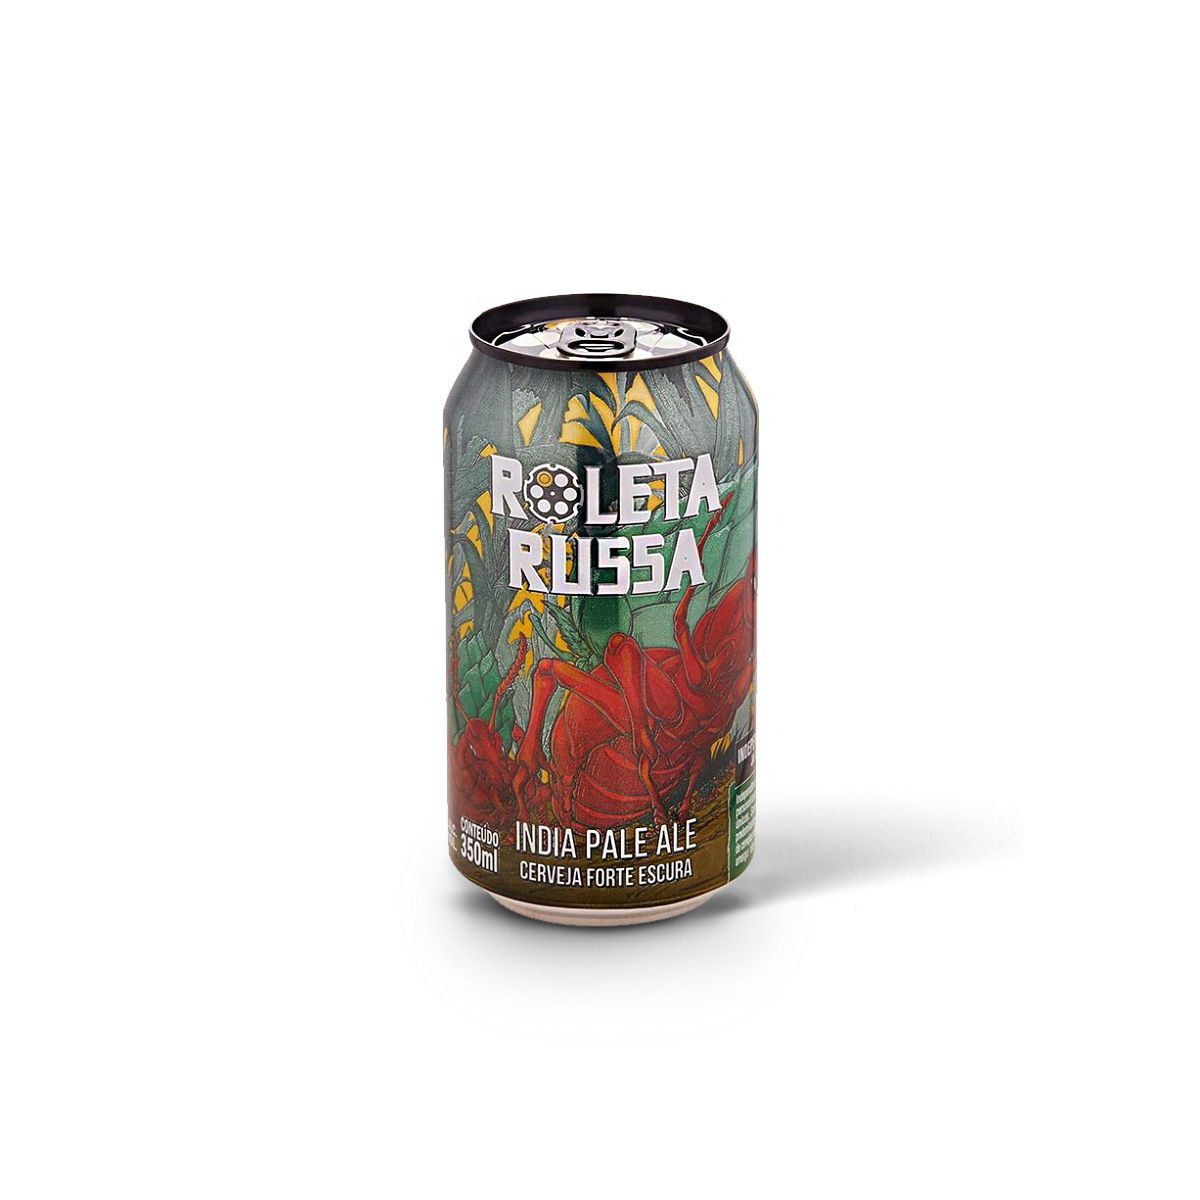 Roleta Russa India Pale Ale IPA 350ml  - RS BEER - Cervejas Gaúchas